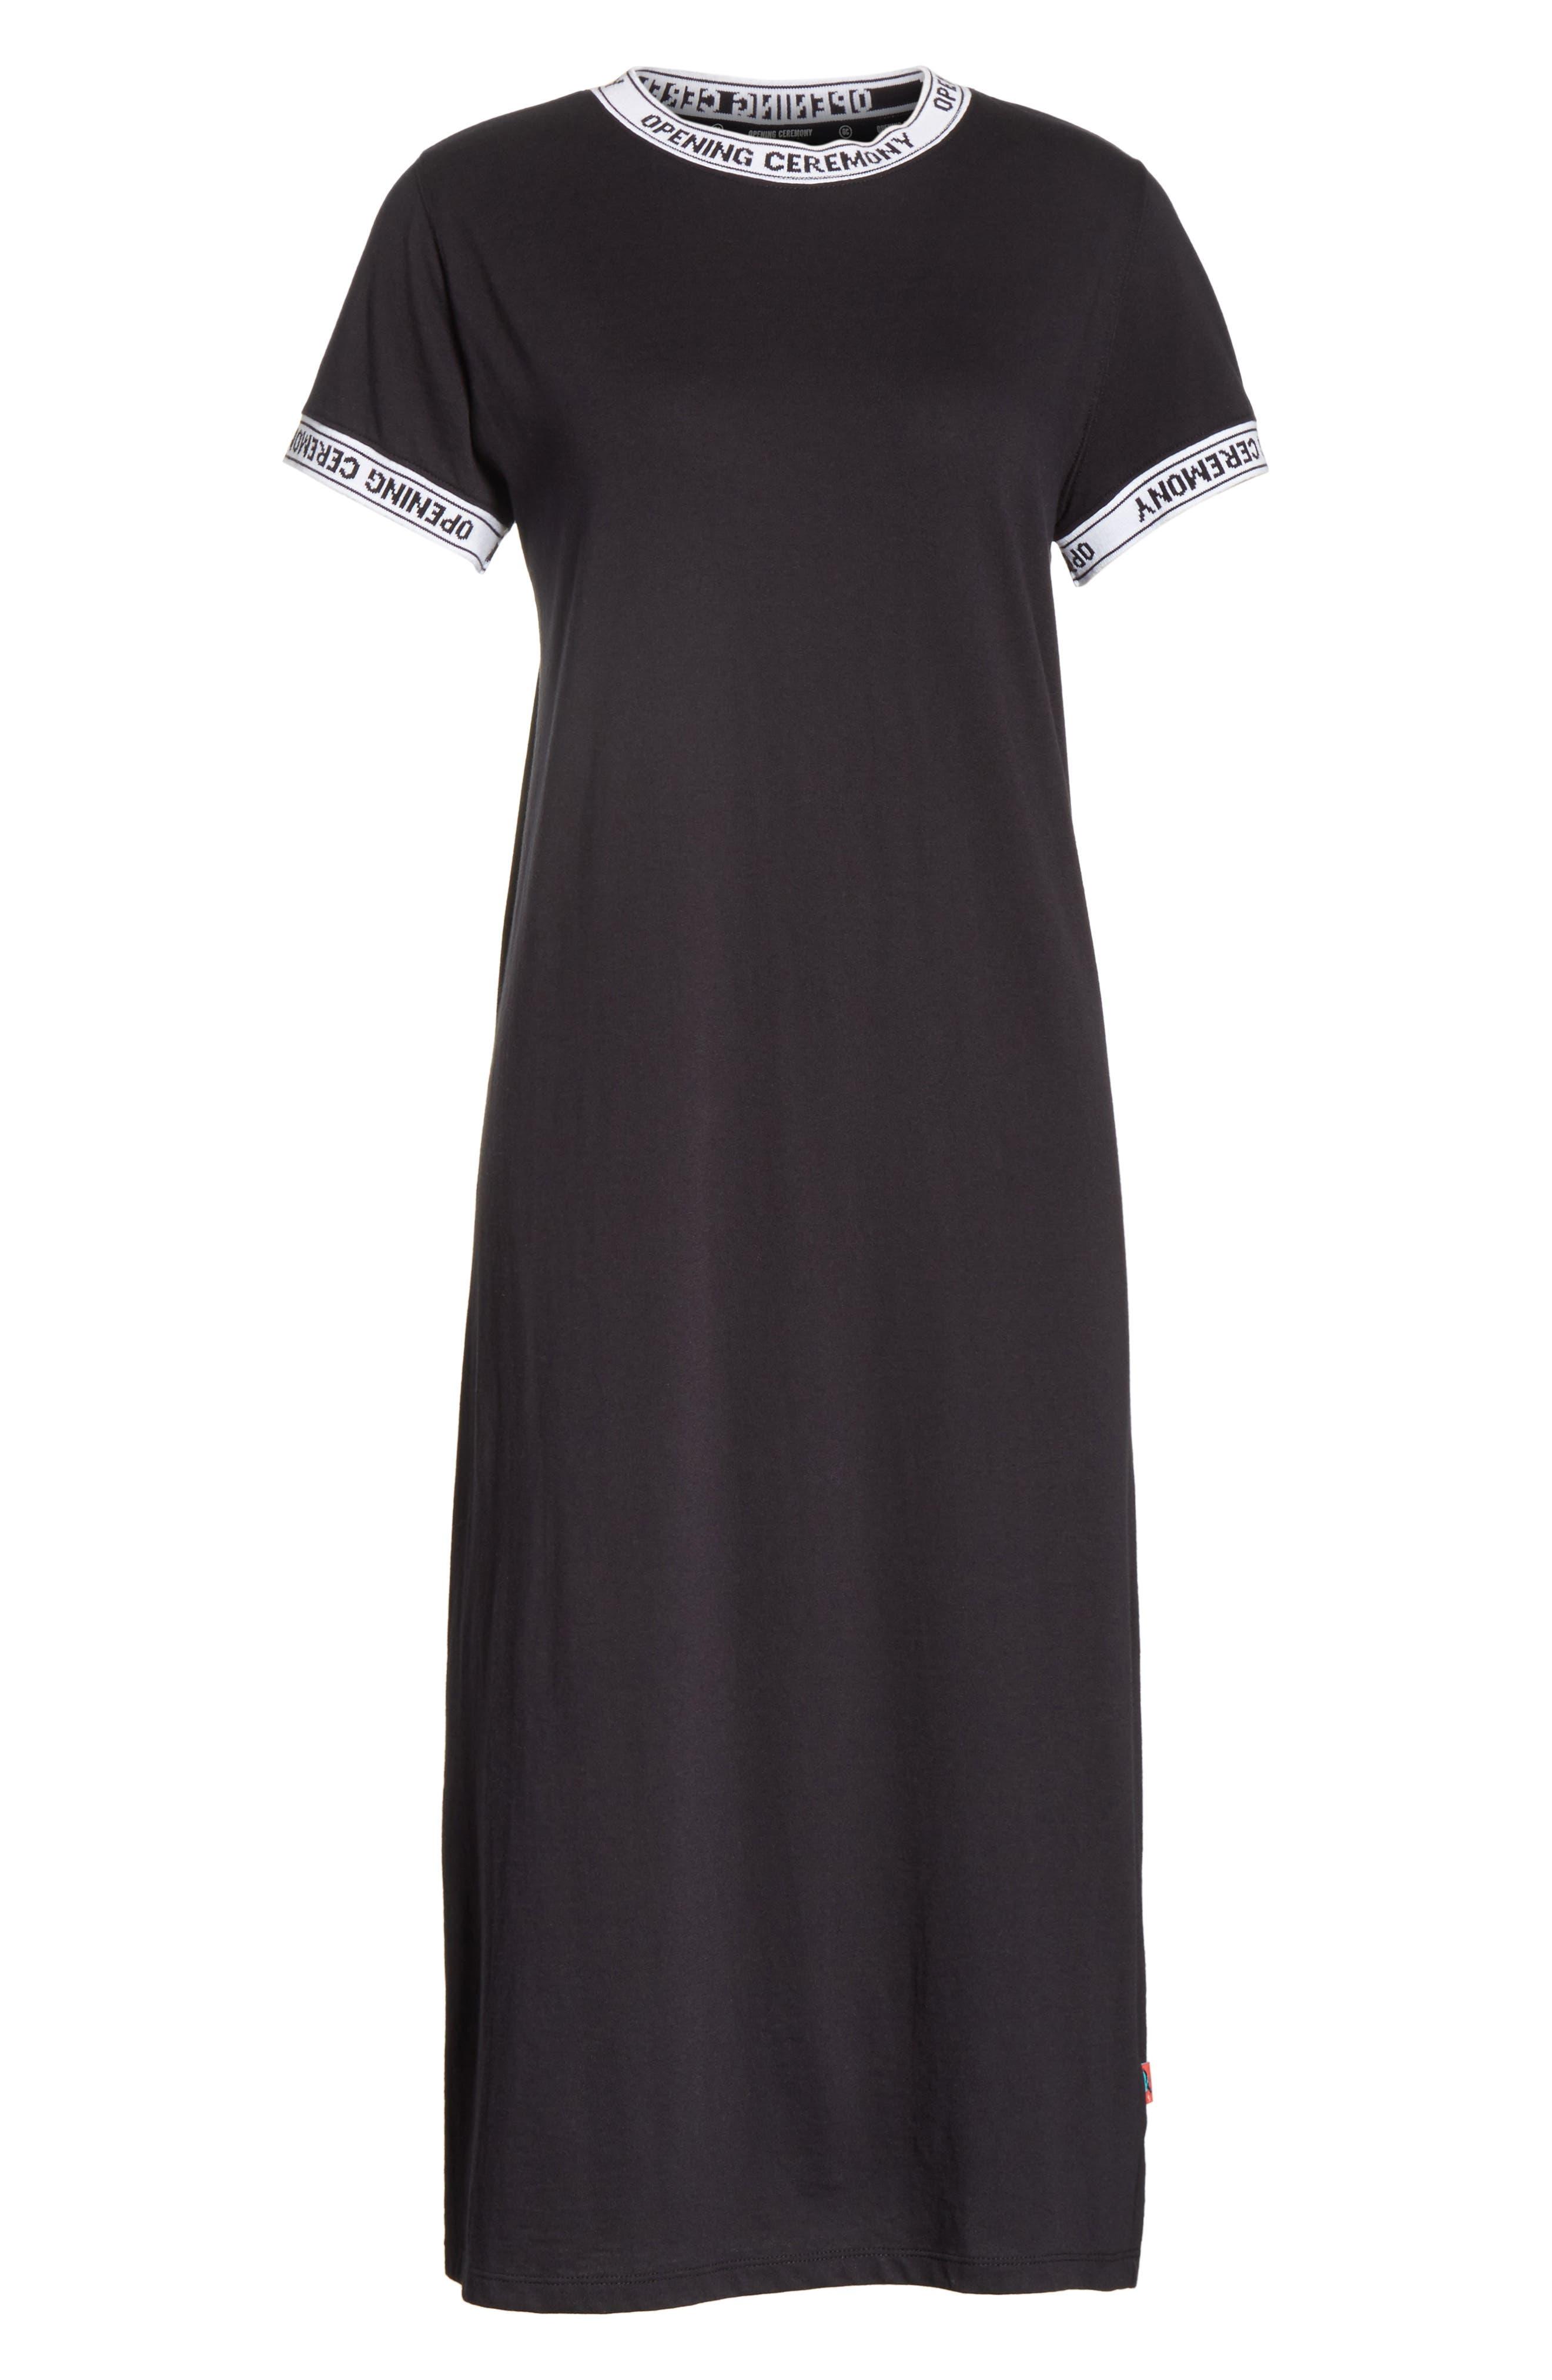 Banded T-Shirt Dress,                             Alternate thumbnail 6, color,                             Black